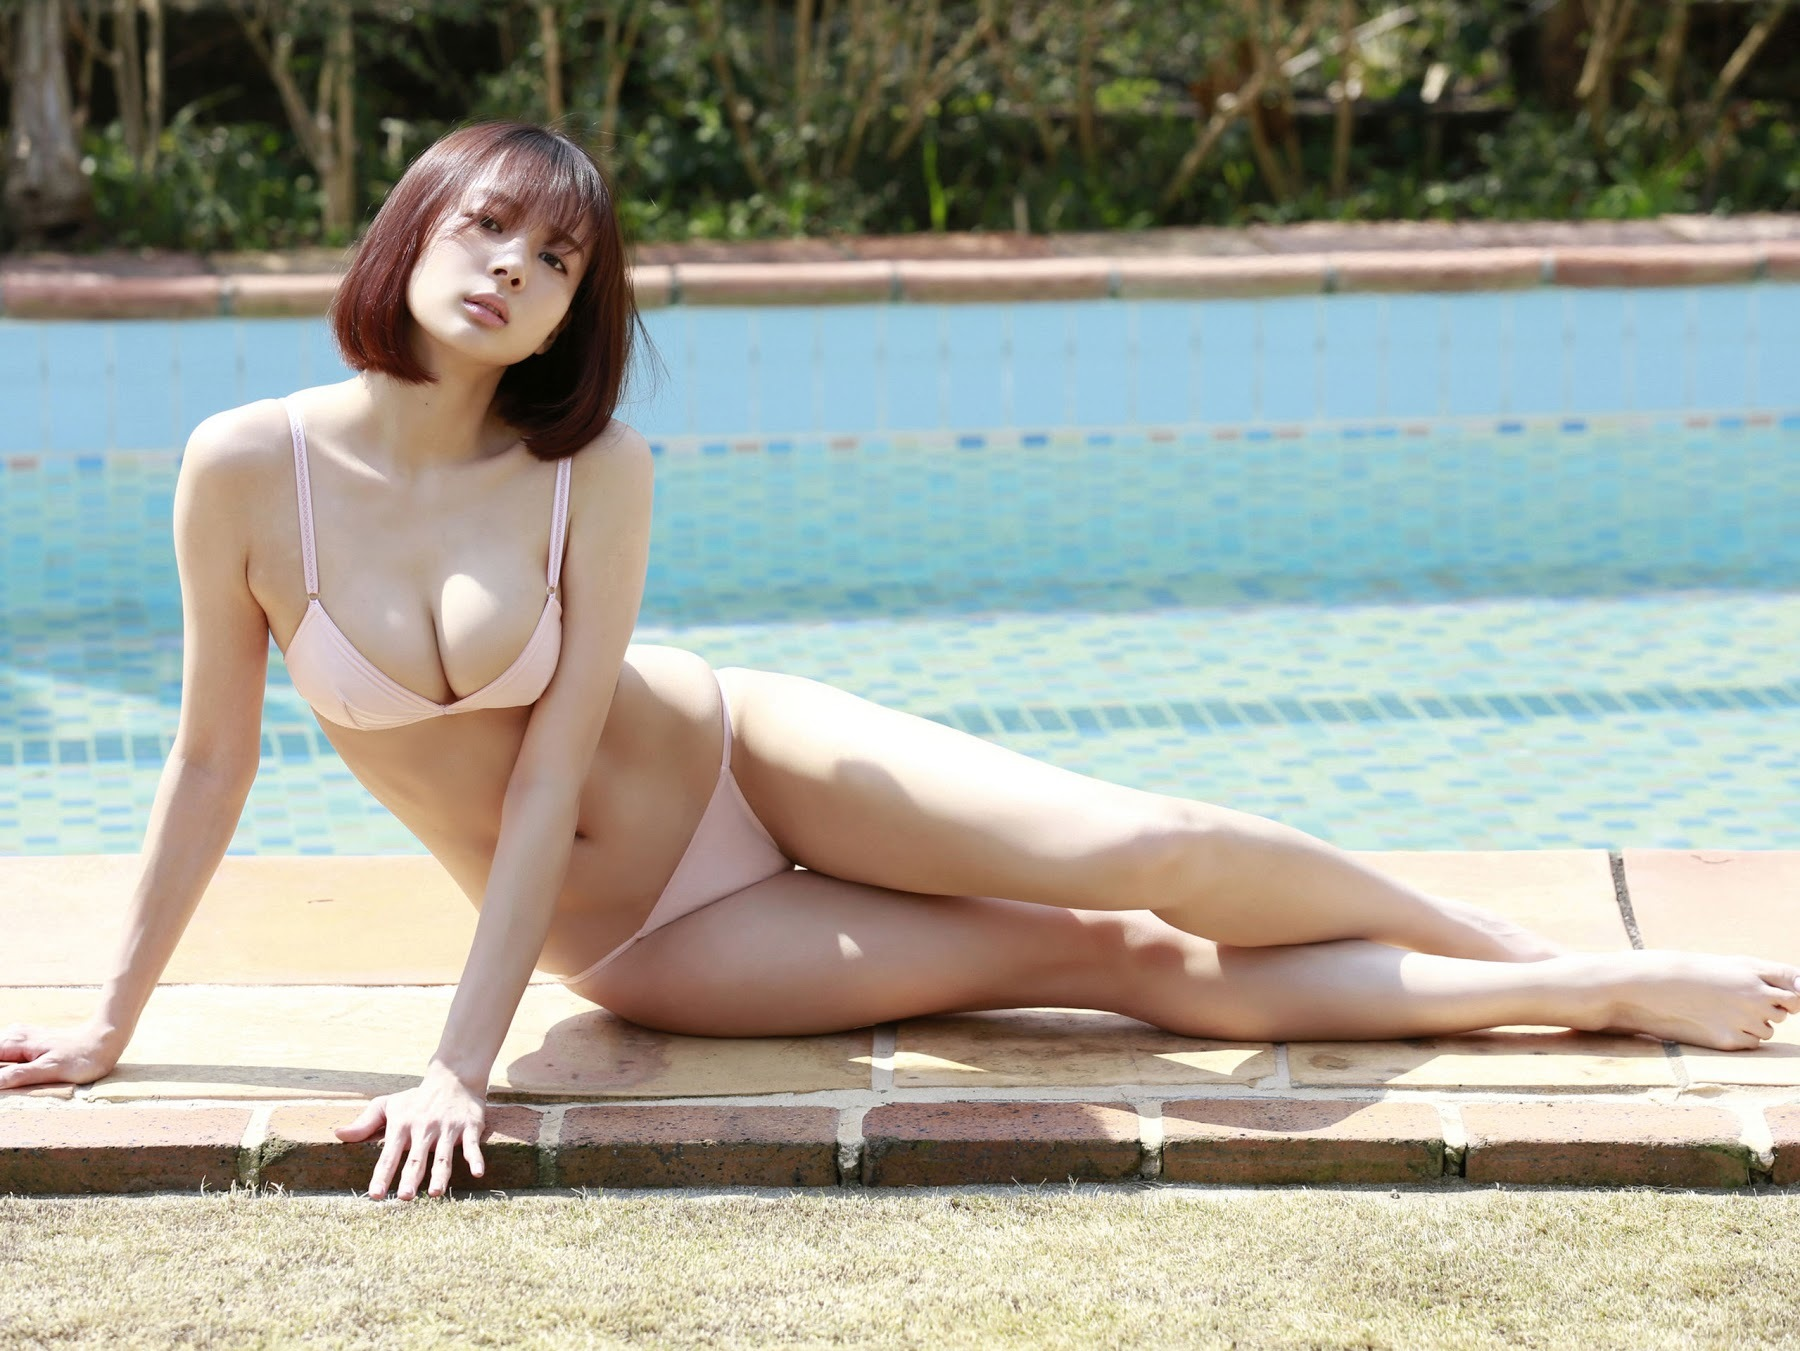 23 years old Shaka Okada, who is also a professional mahjong player007